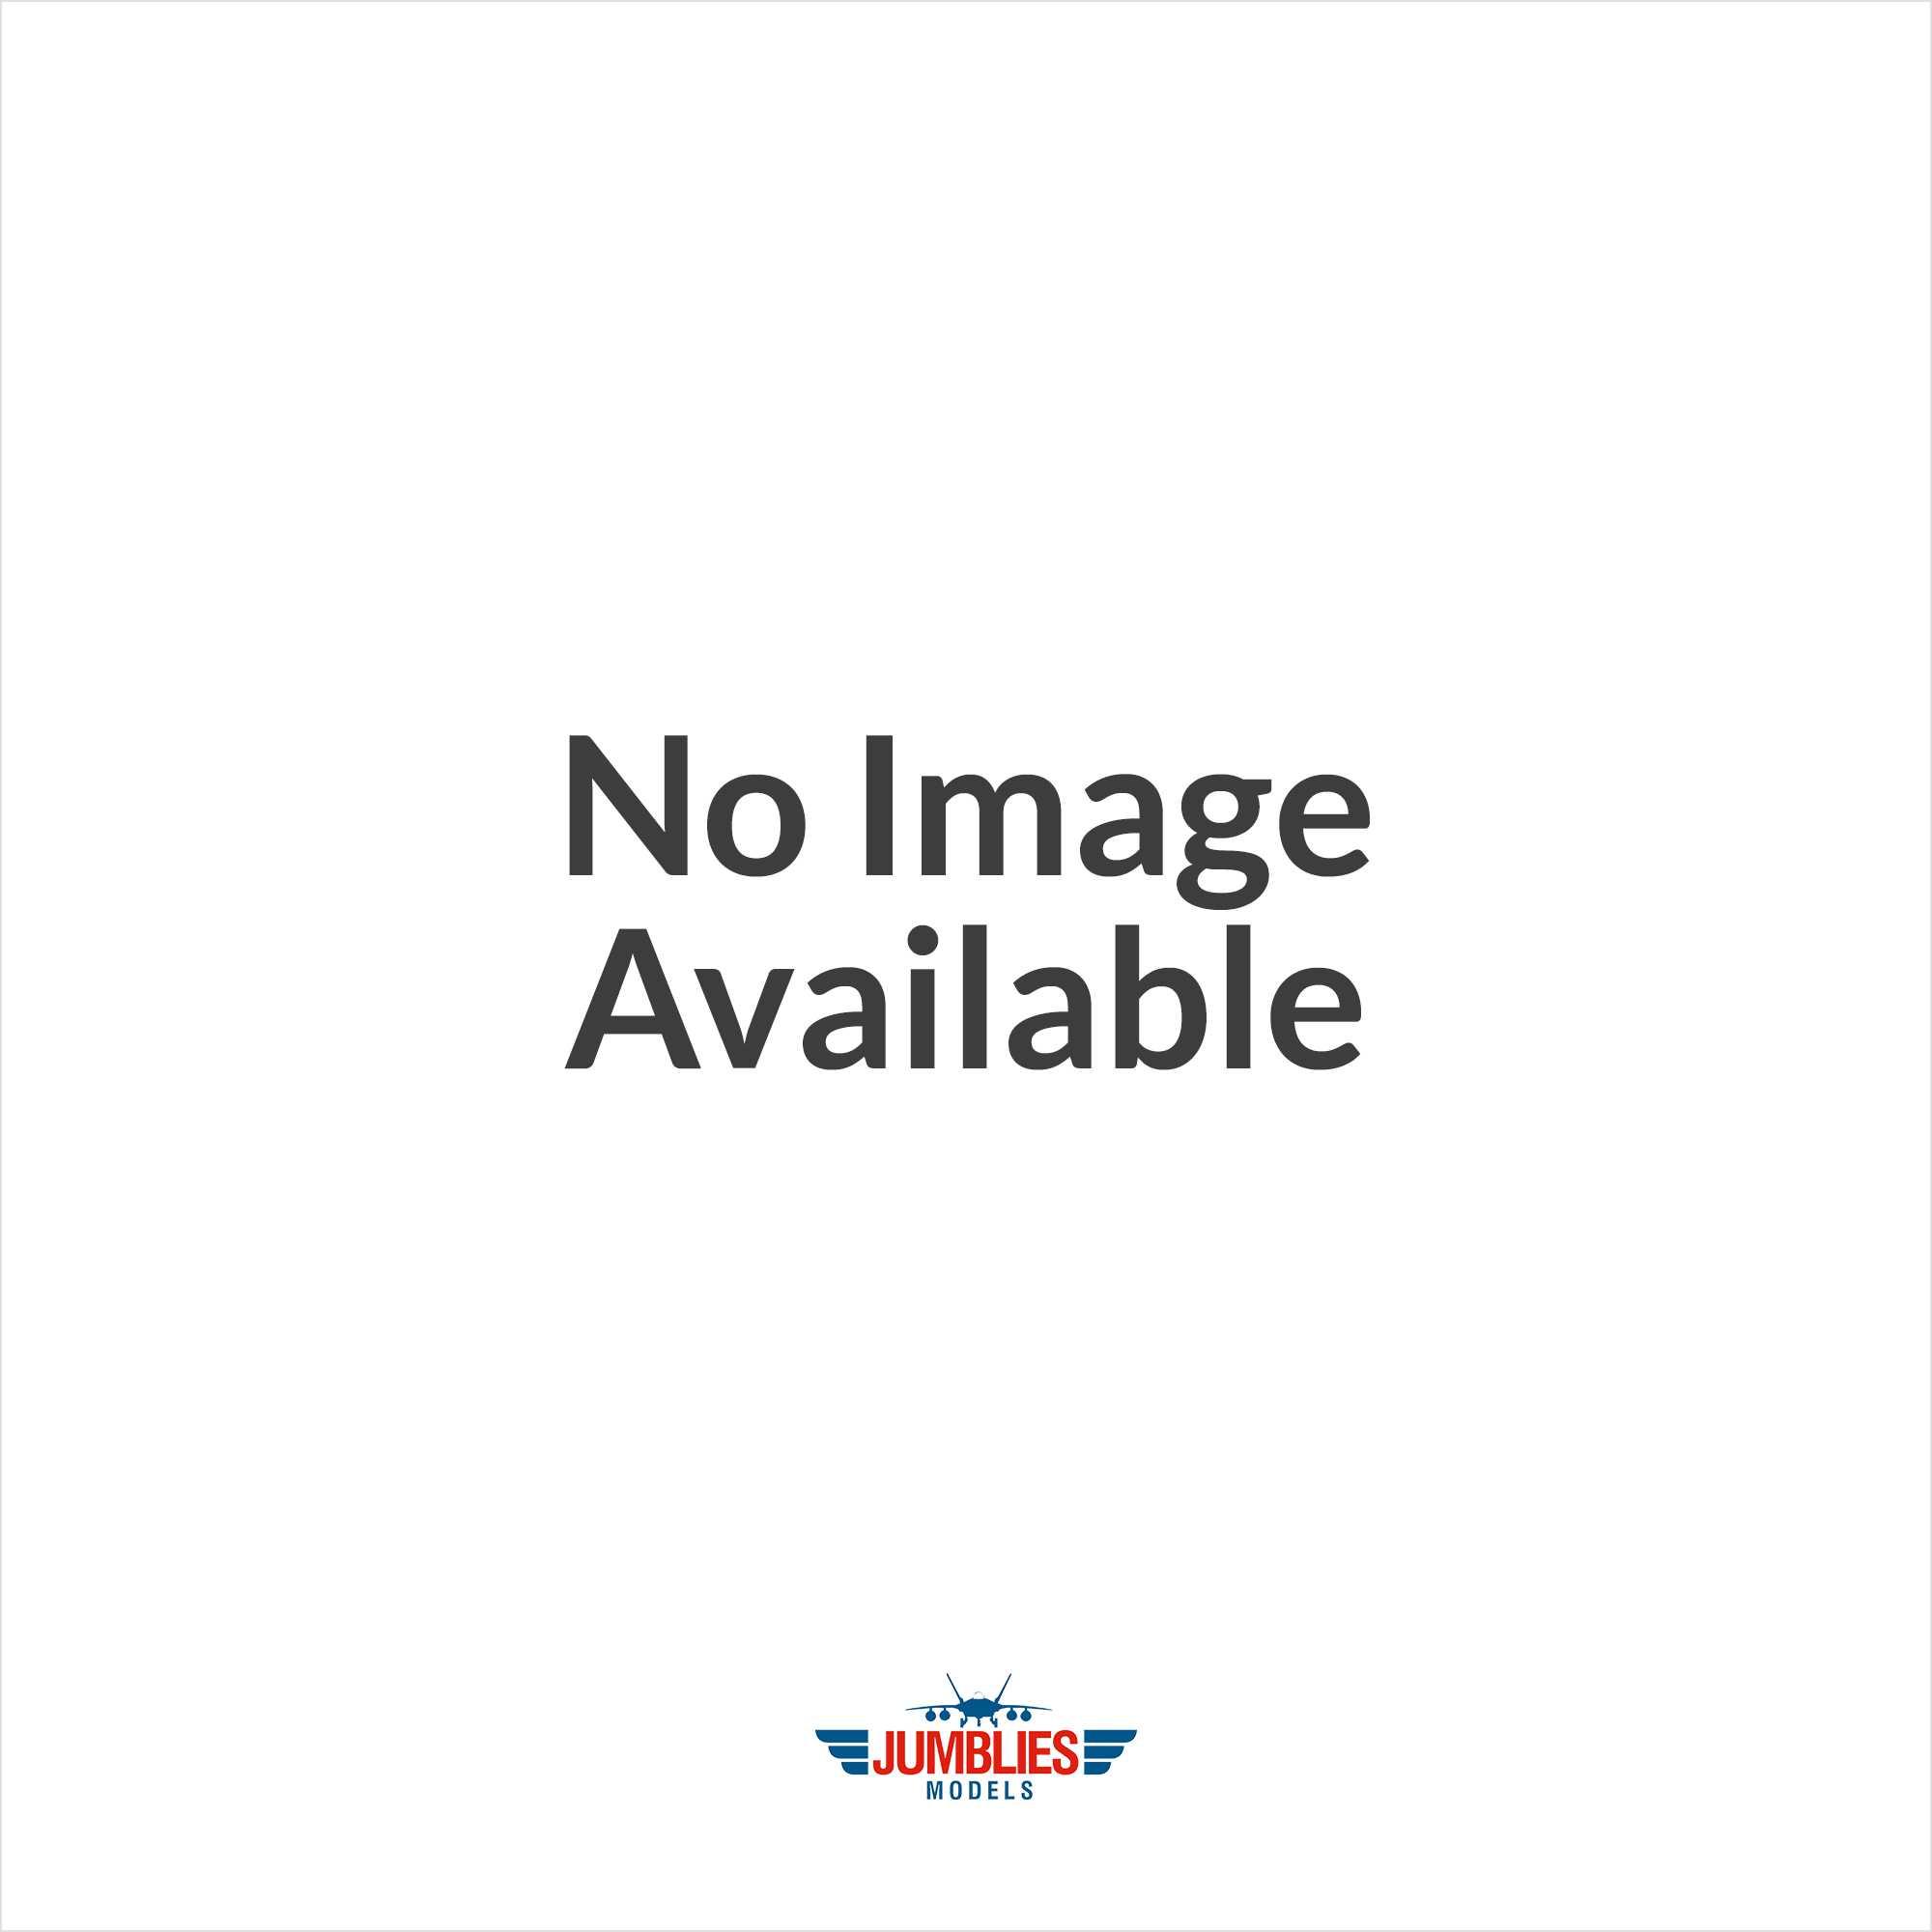 Minichamps Yamaha Ytz-M1 Yamaha Factory Racing - Valentino Rossi MotoGP 2014 - 1:12 Scale Diecast Model